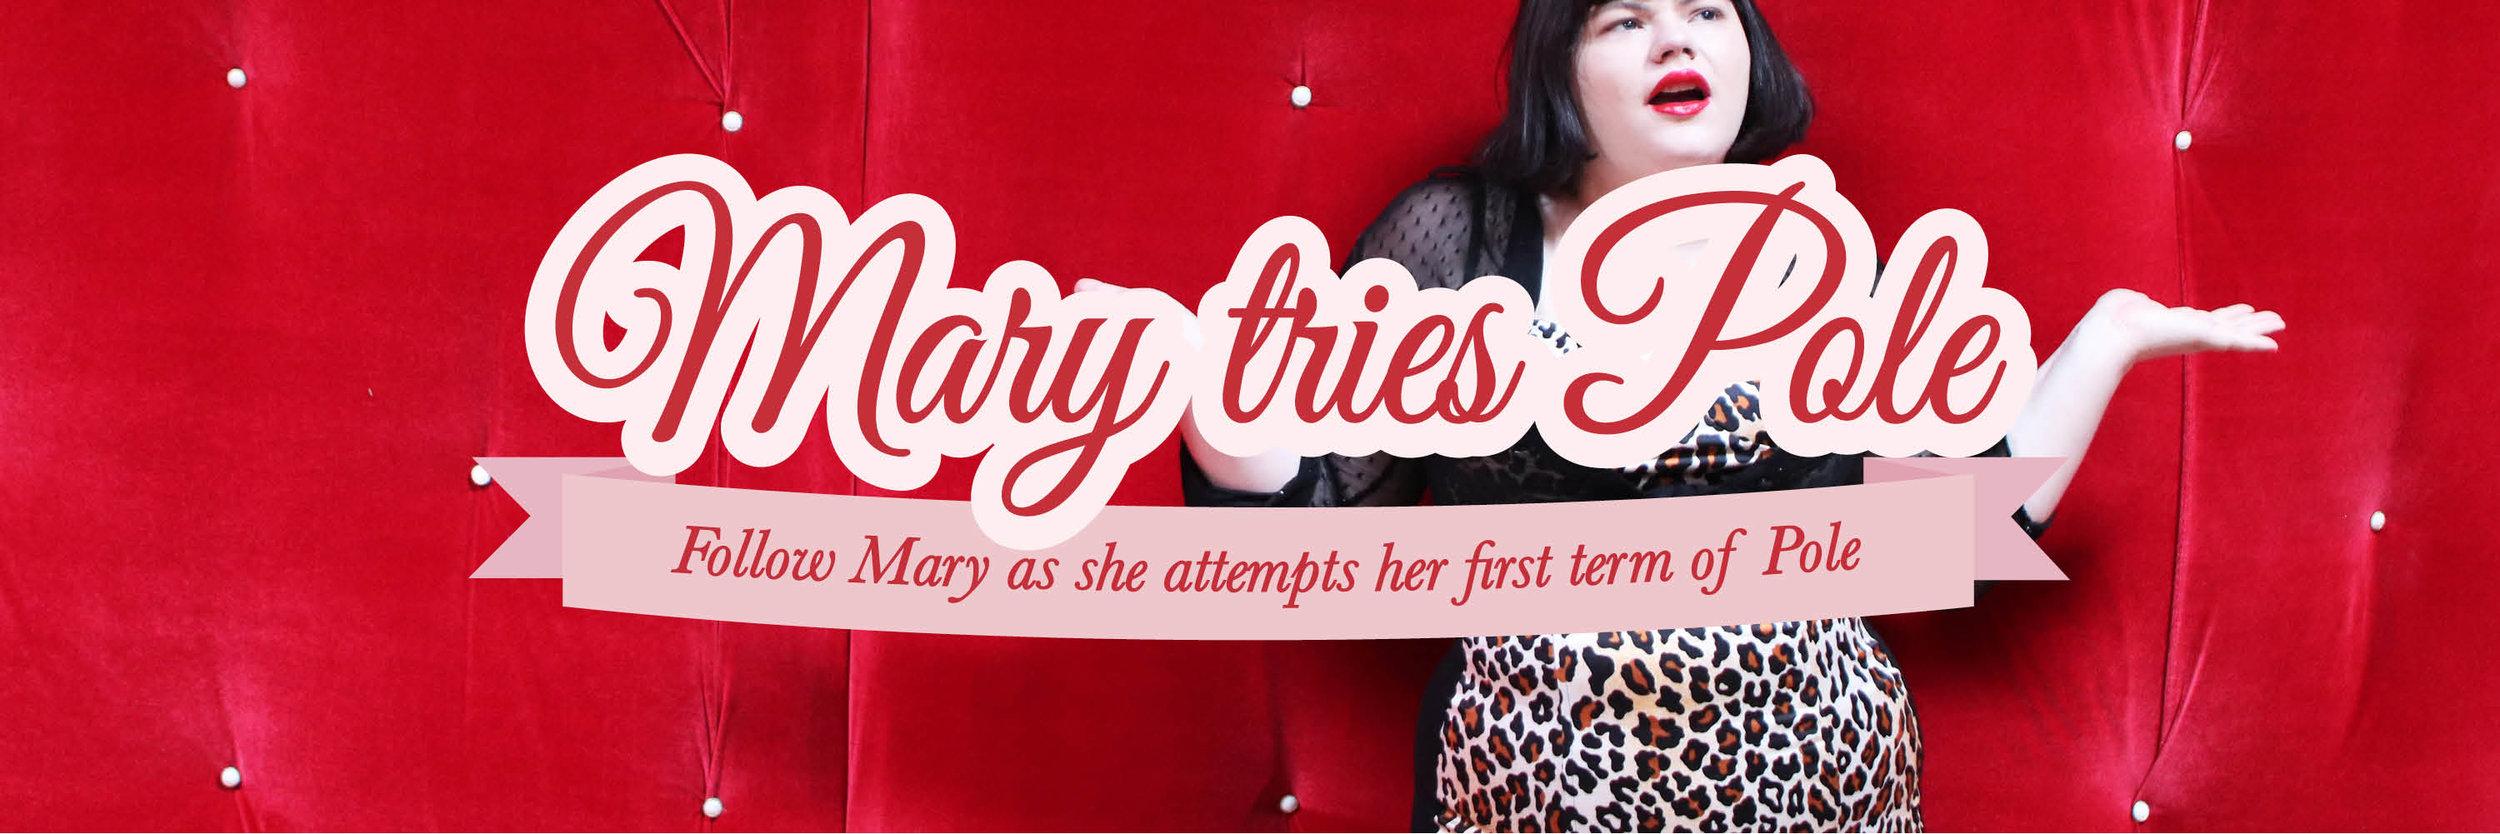 mary-tries-pole-banner.jpg